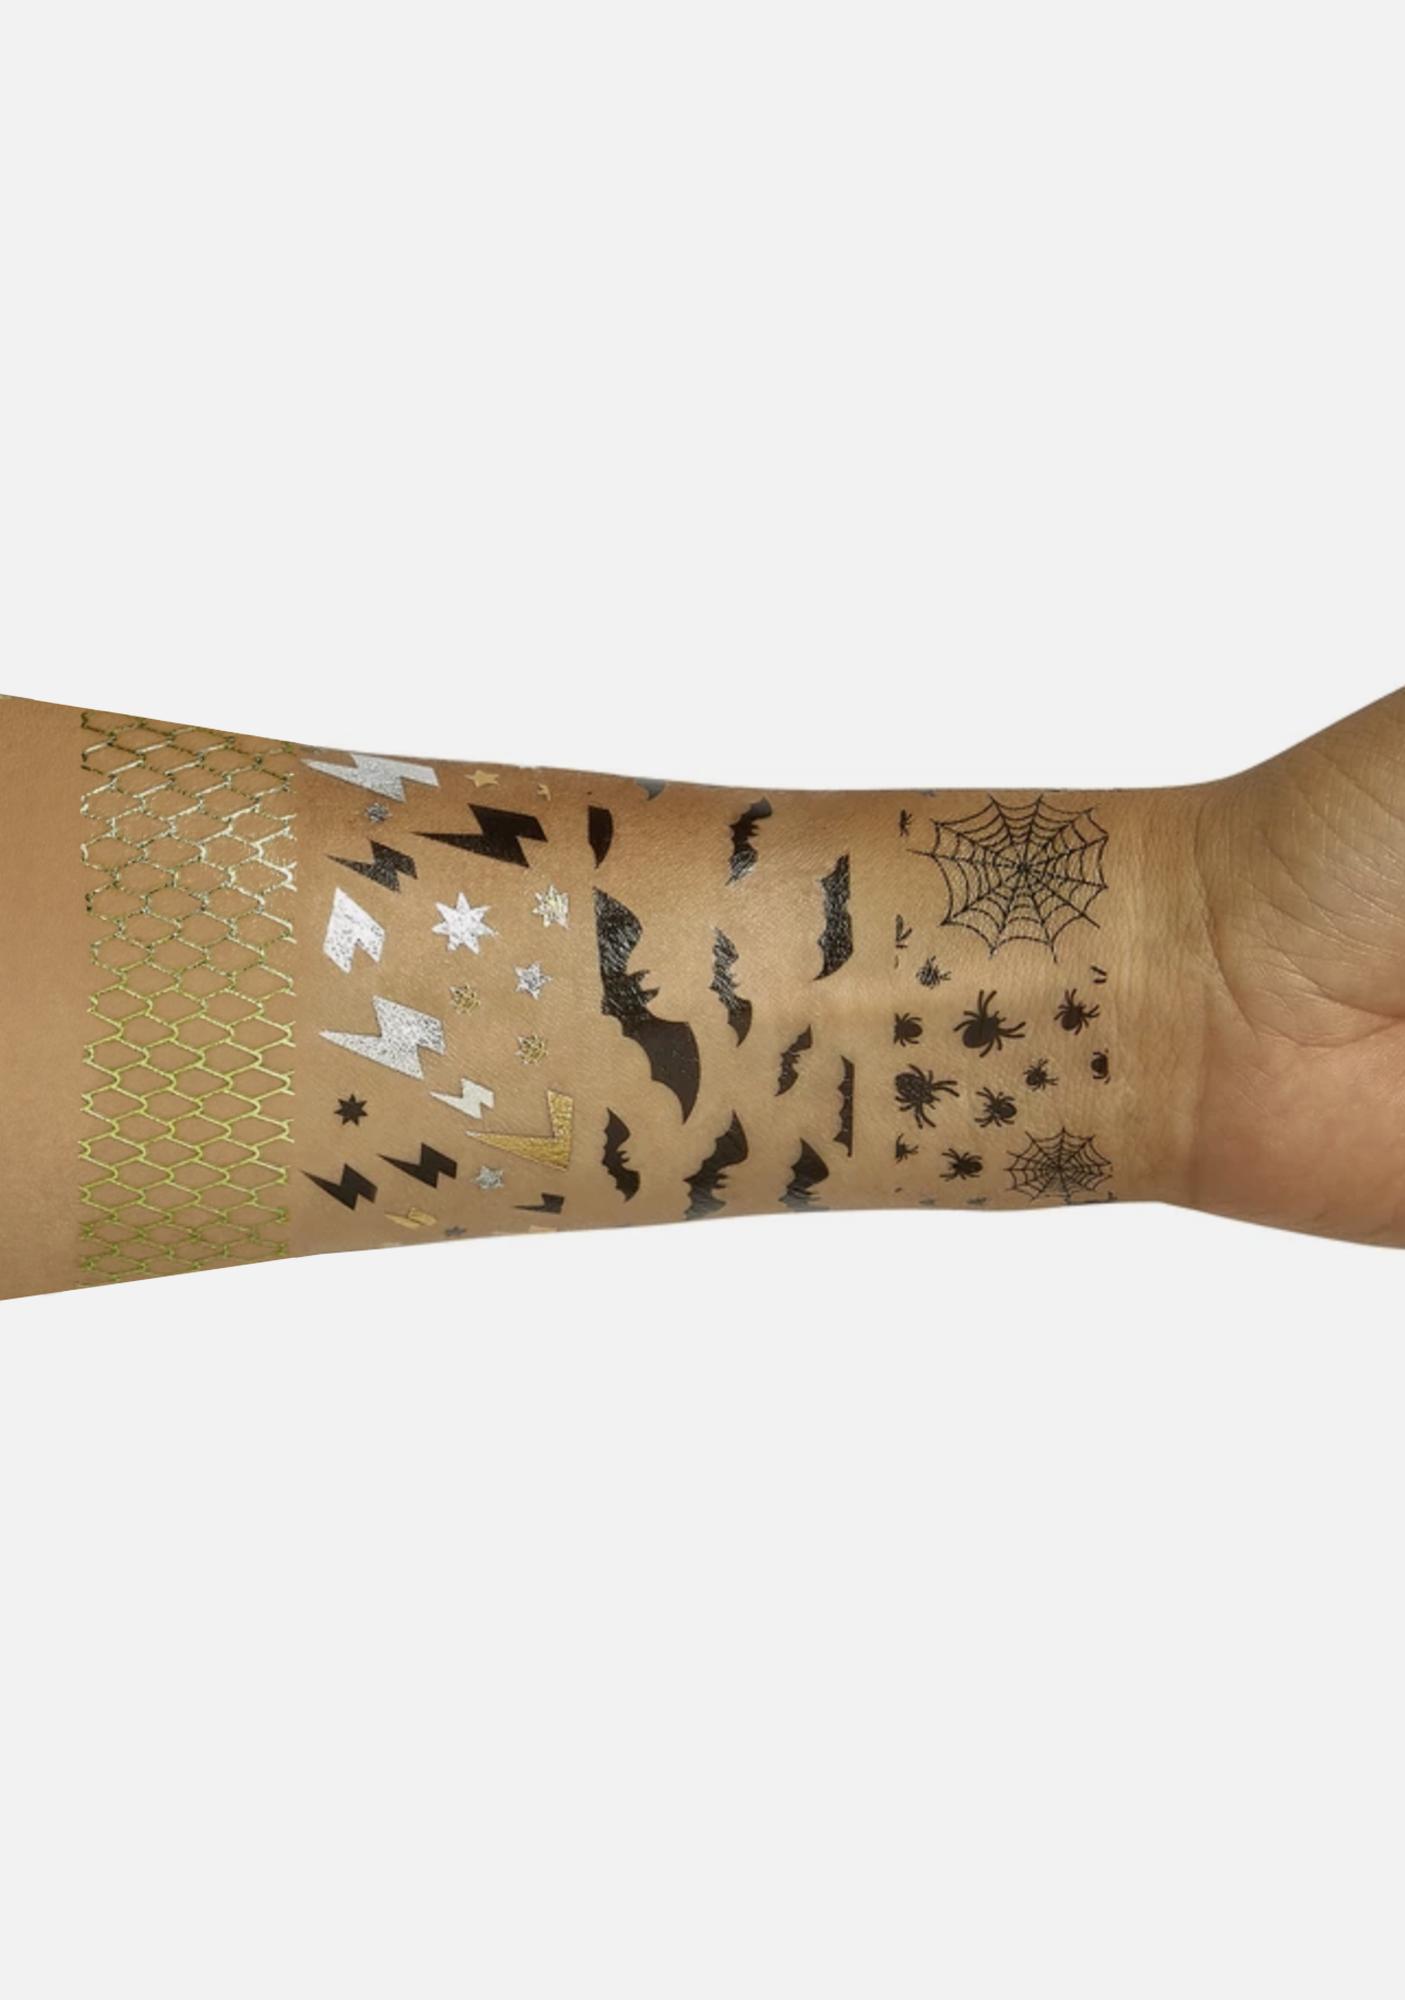 Go Get Glitter Bat Transfer Tattoos